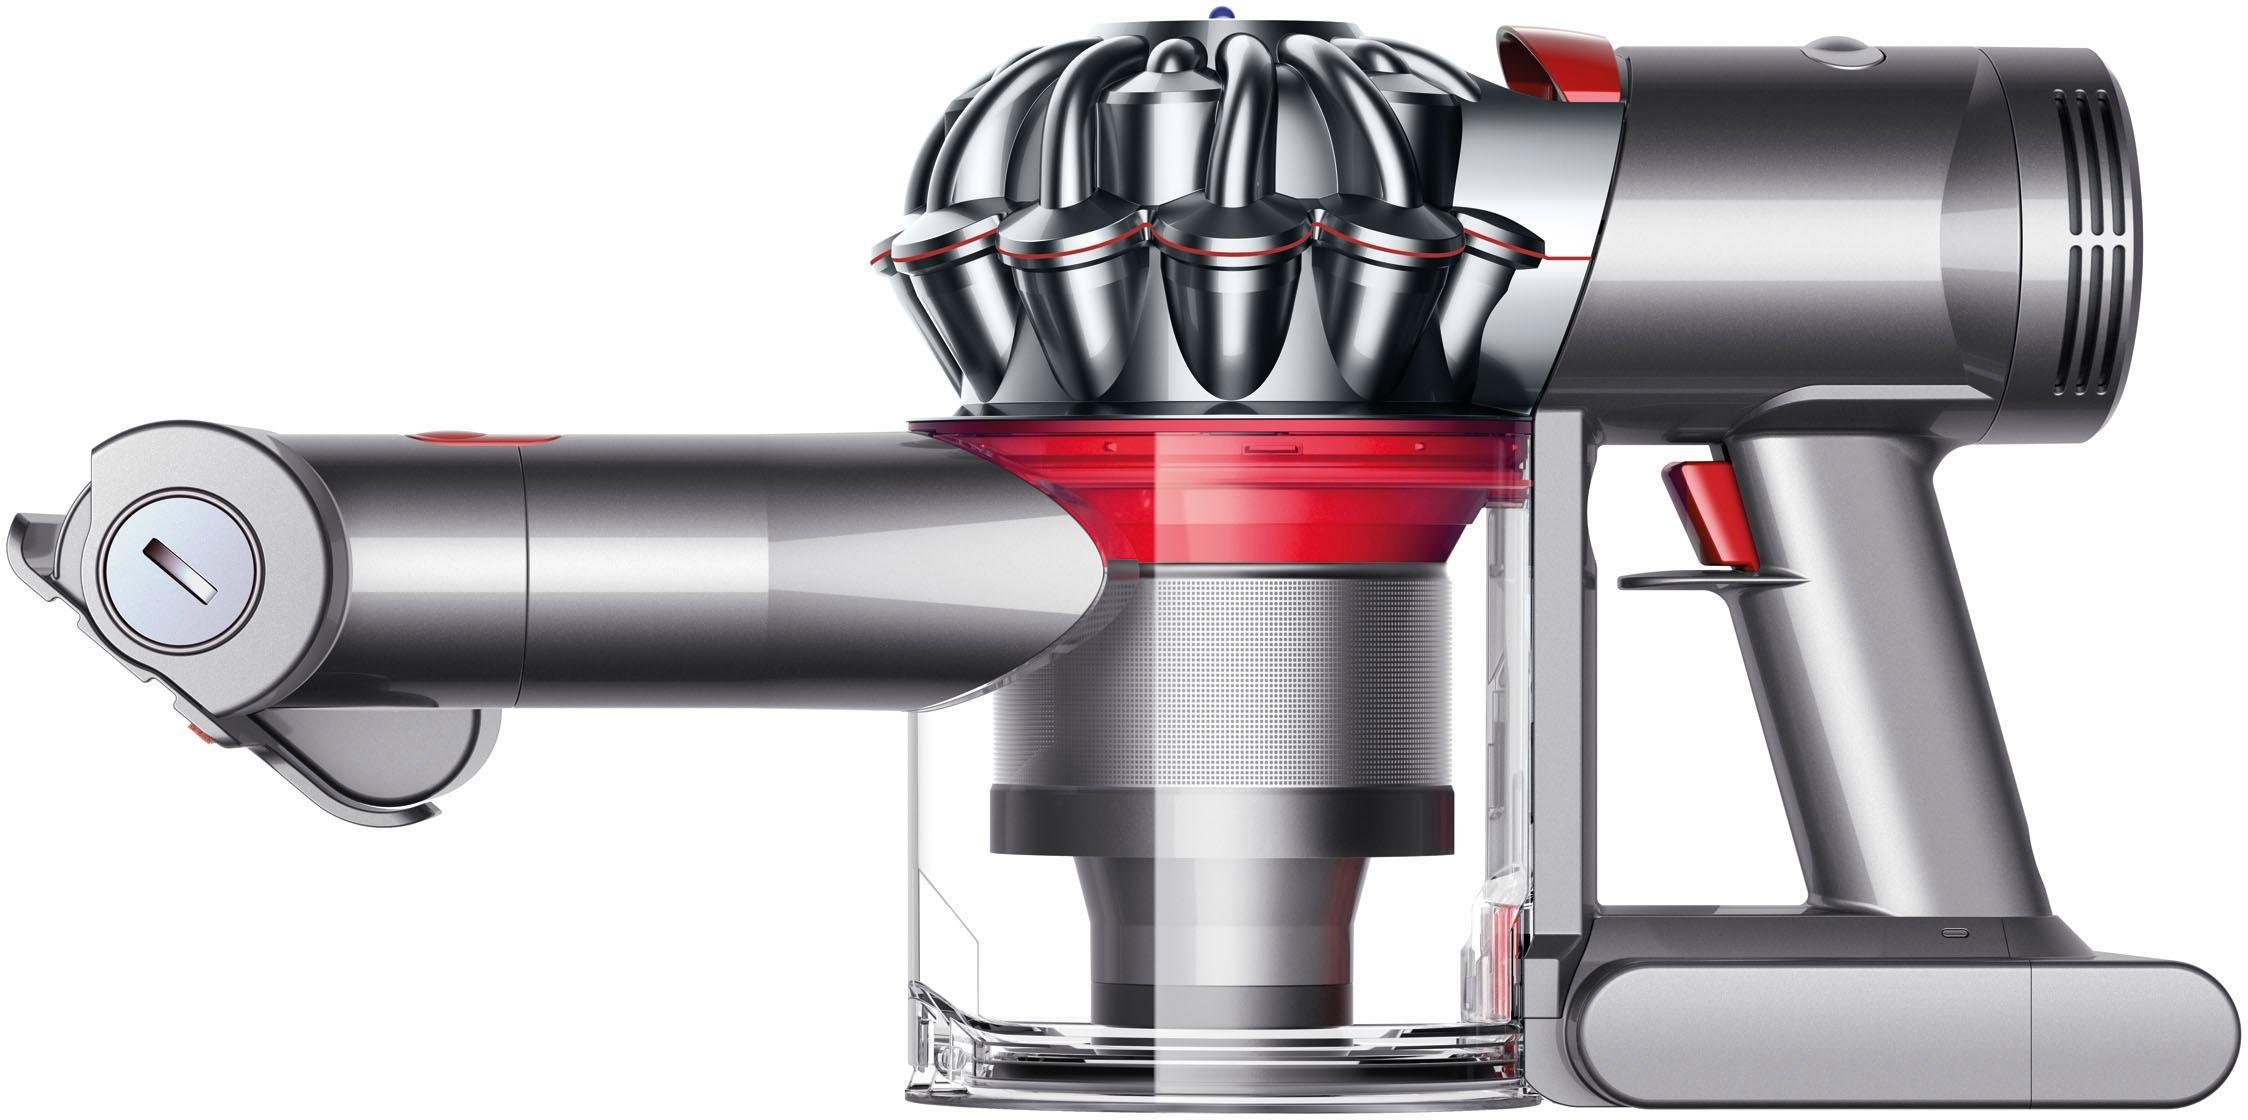 Akku-Handstaubsauger V7 Trigger, 350 Watt, beutellos